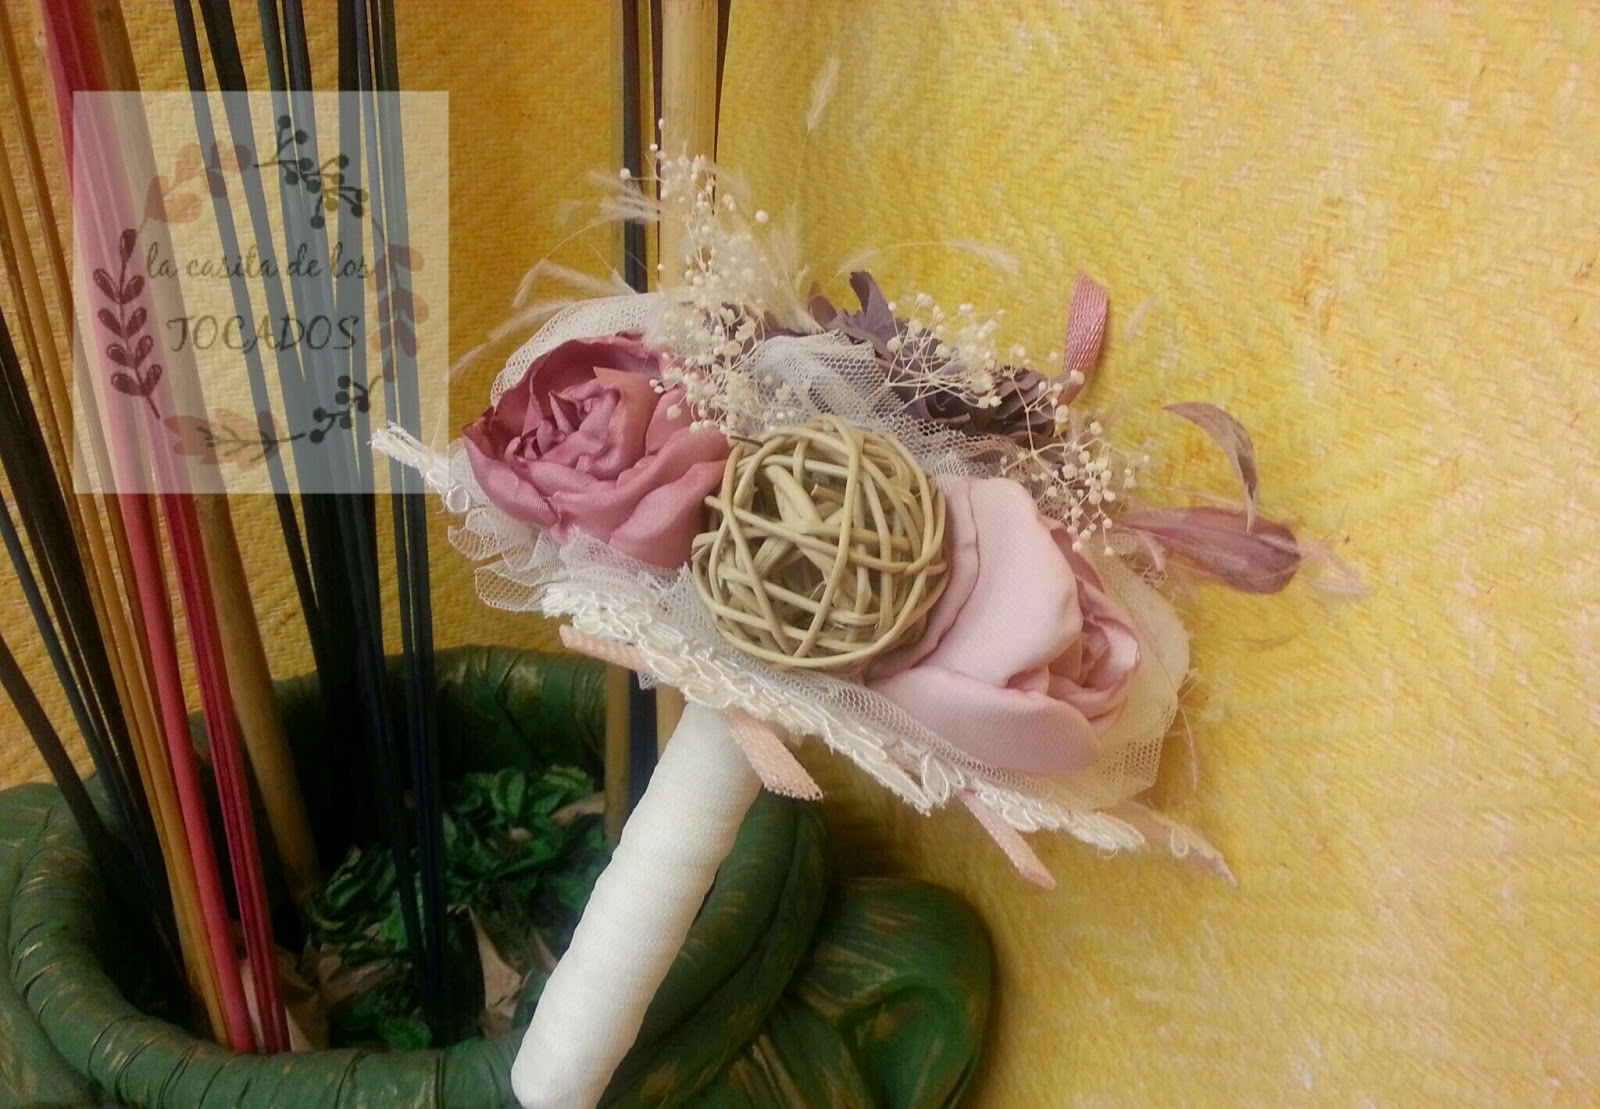 ramo vintage artesanal para novia en tonos rosas, malvas, beige, marfil y blanco